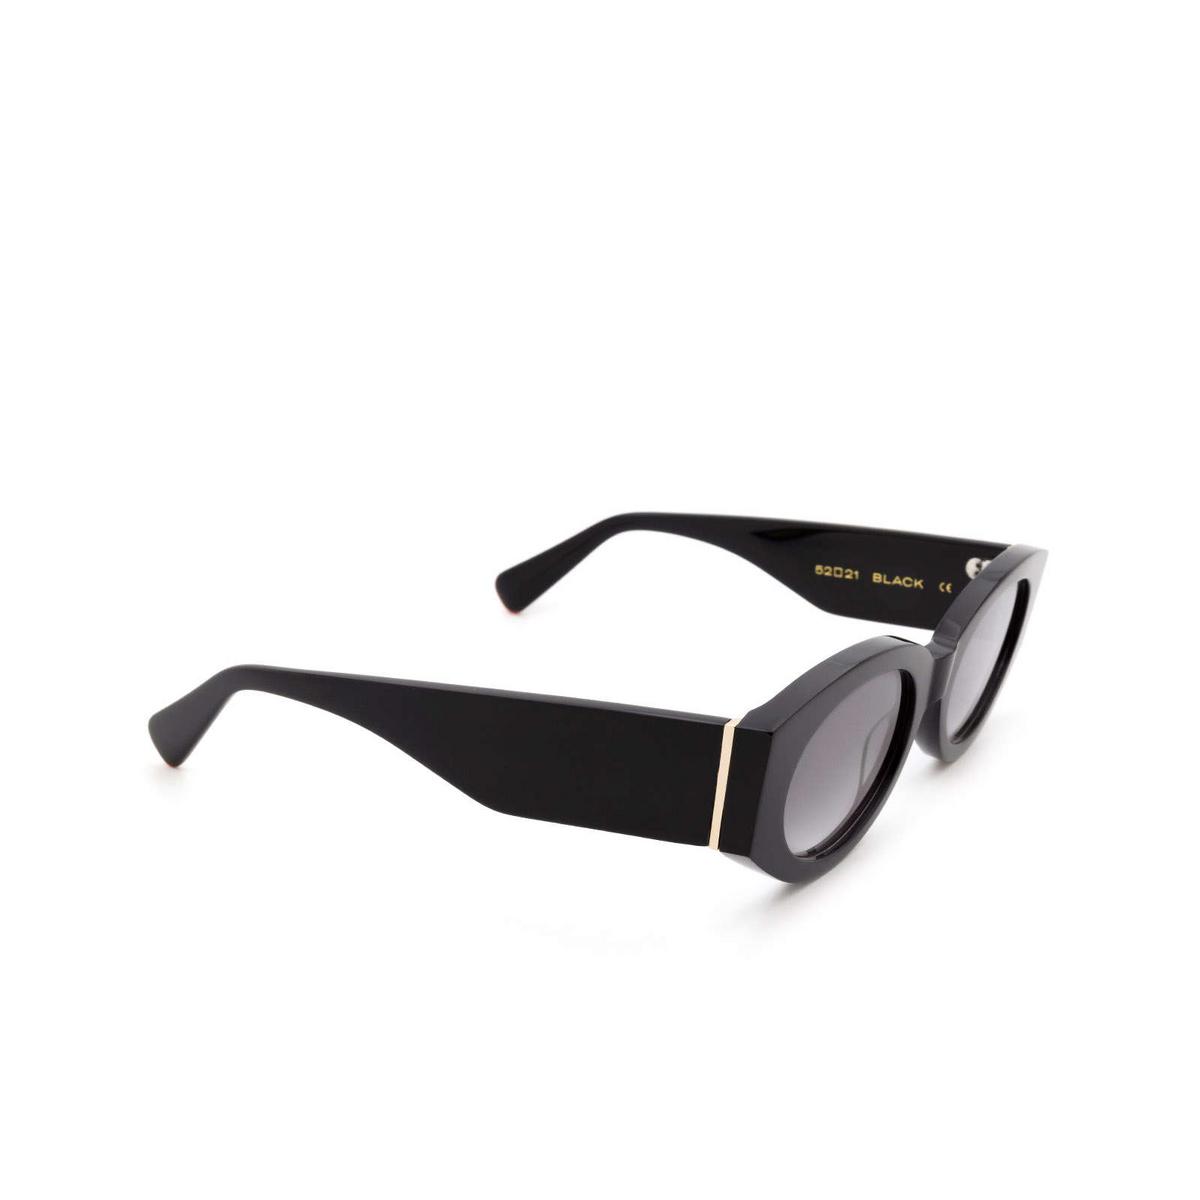 Chimi® Oval Sunglasses: Craftmanship Round color Black - three-quarters view.